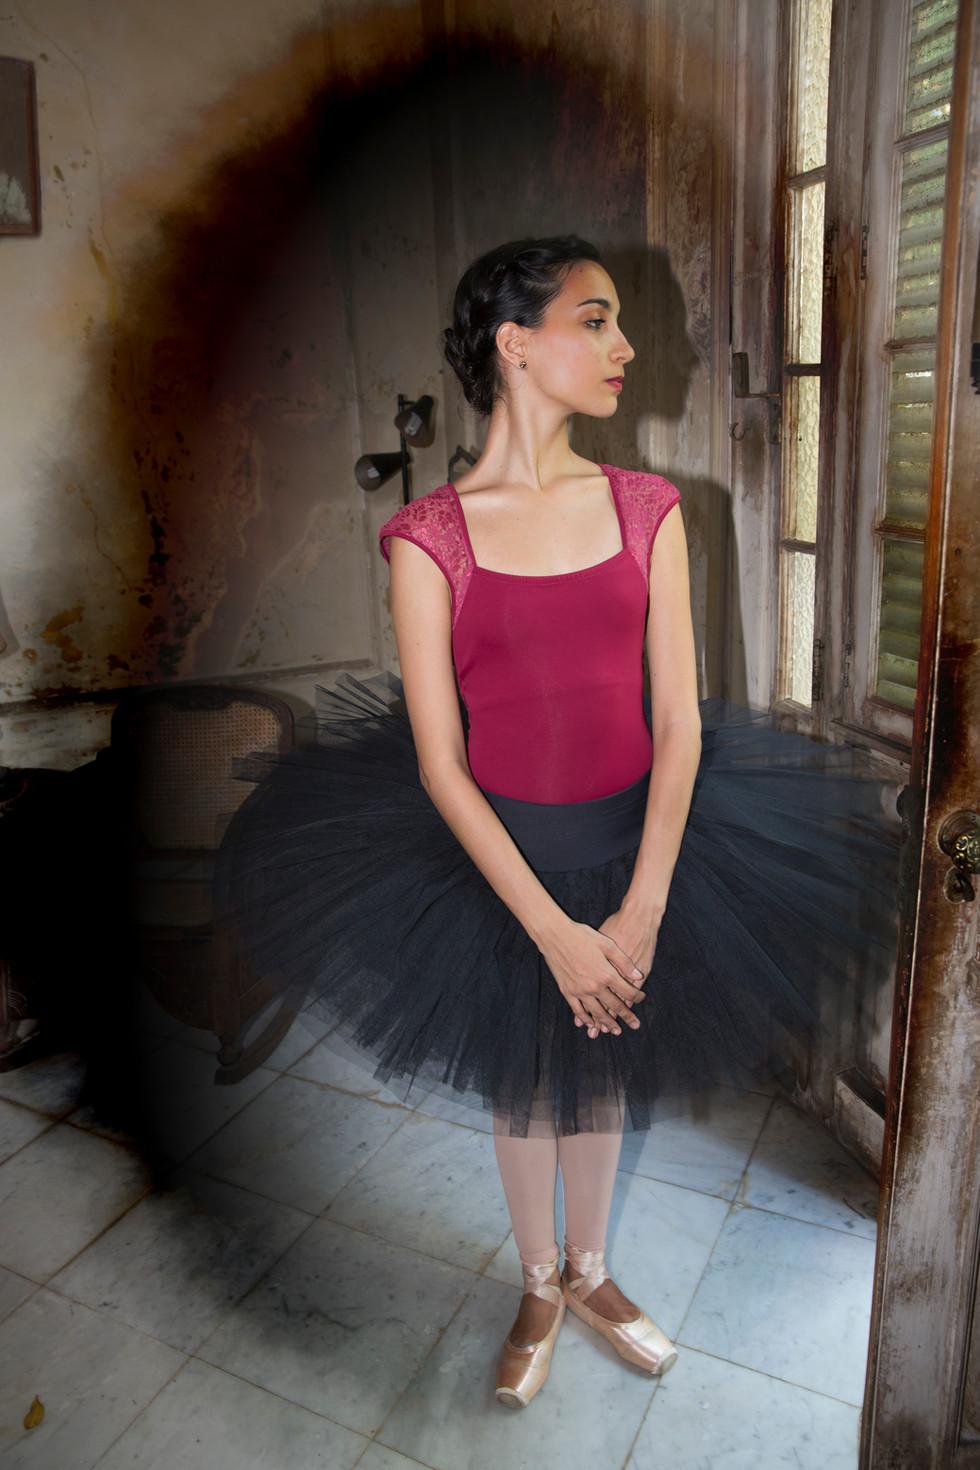 Ballerina in old mansion, Havana